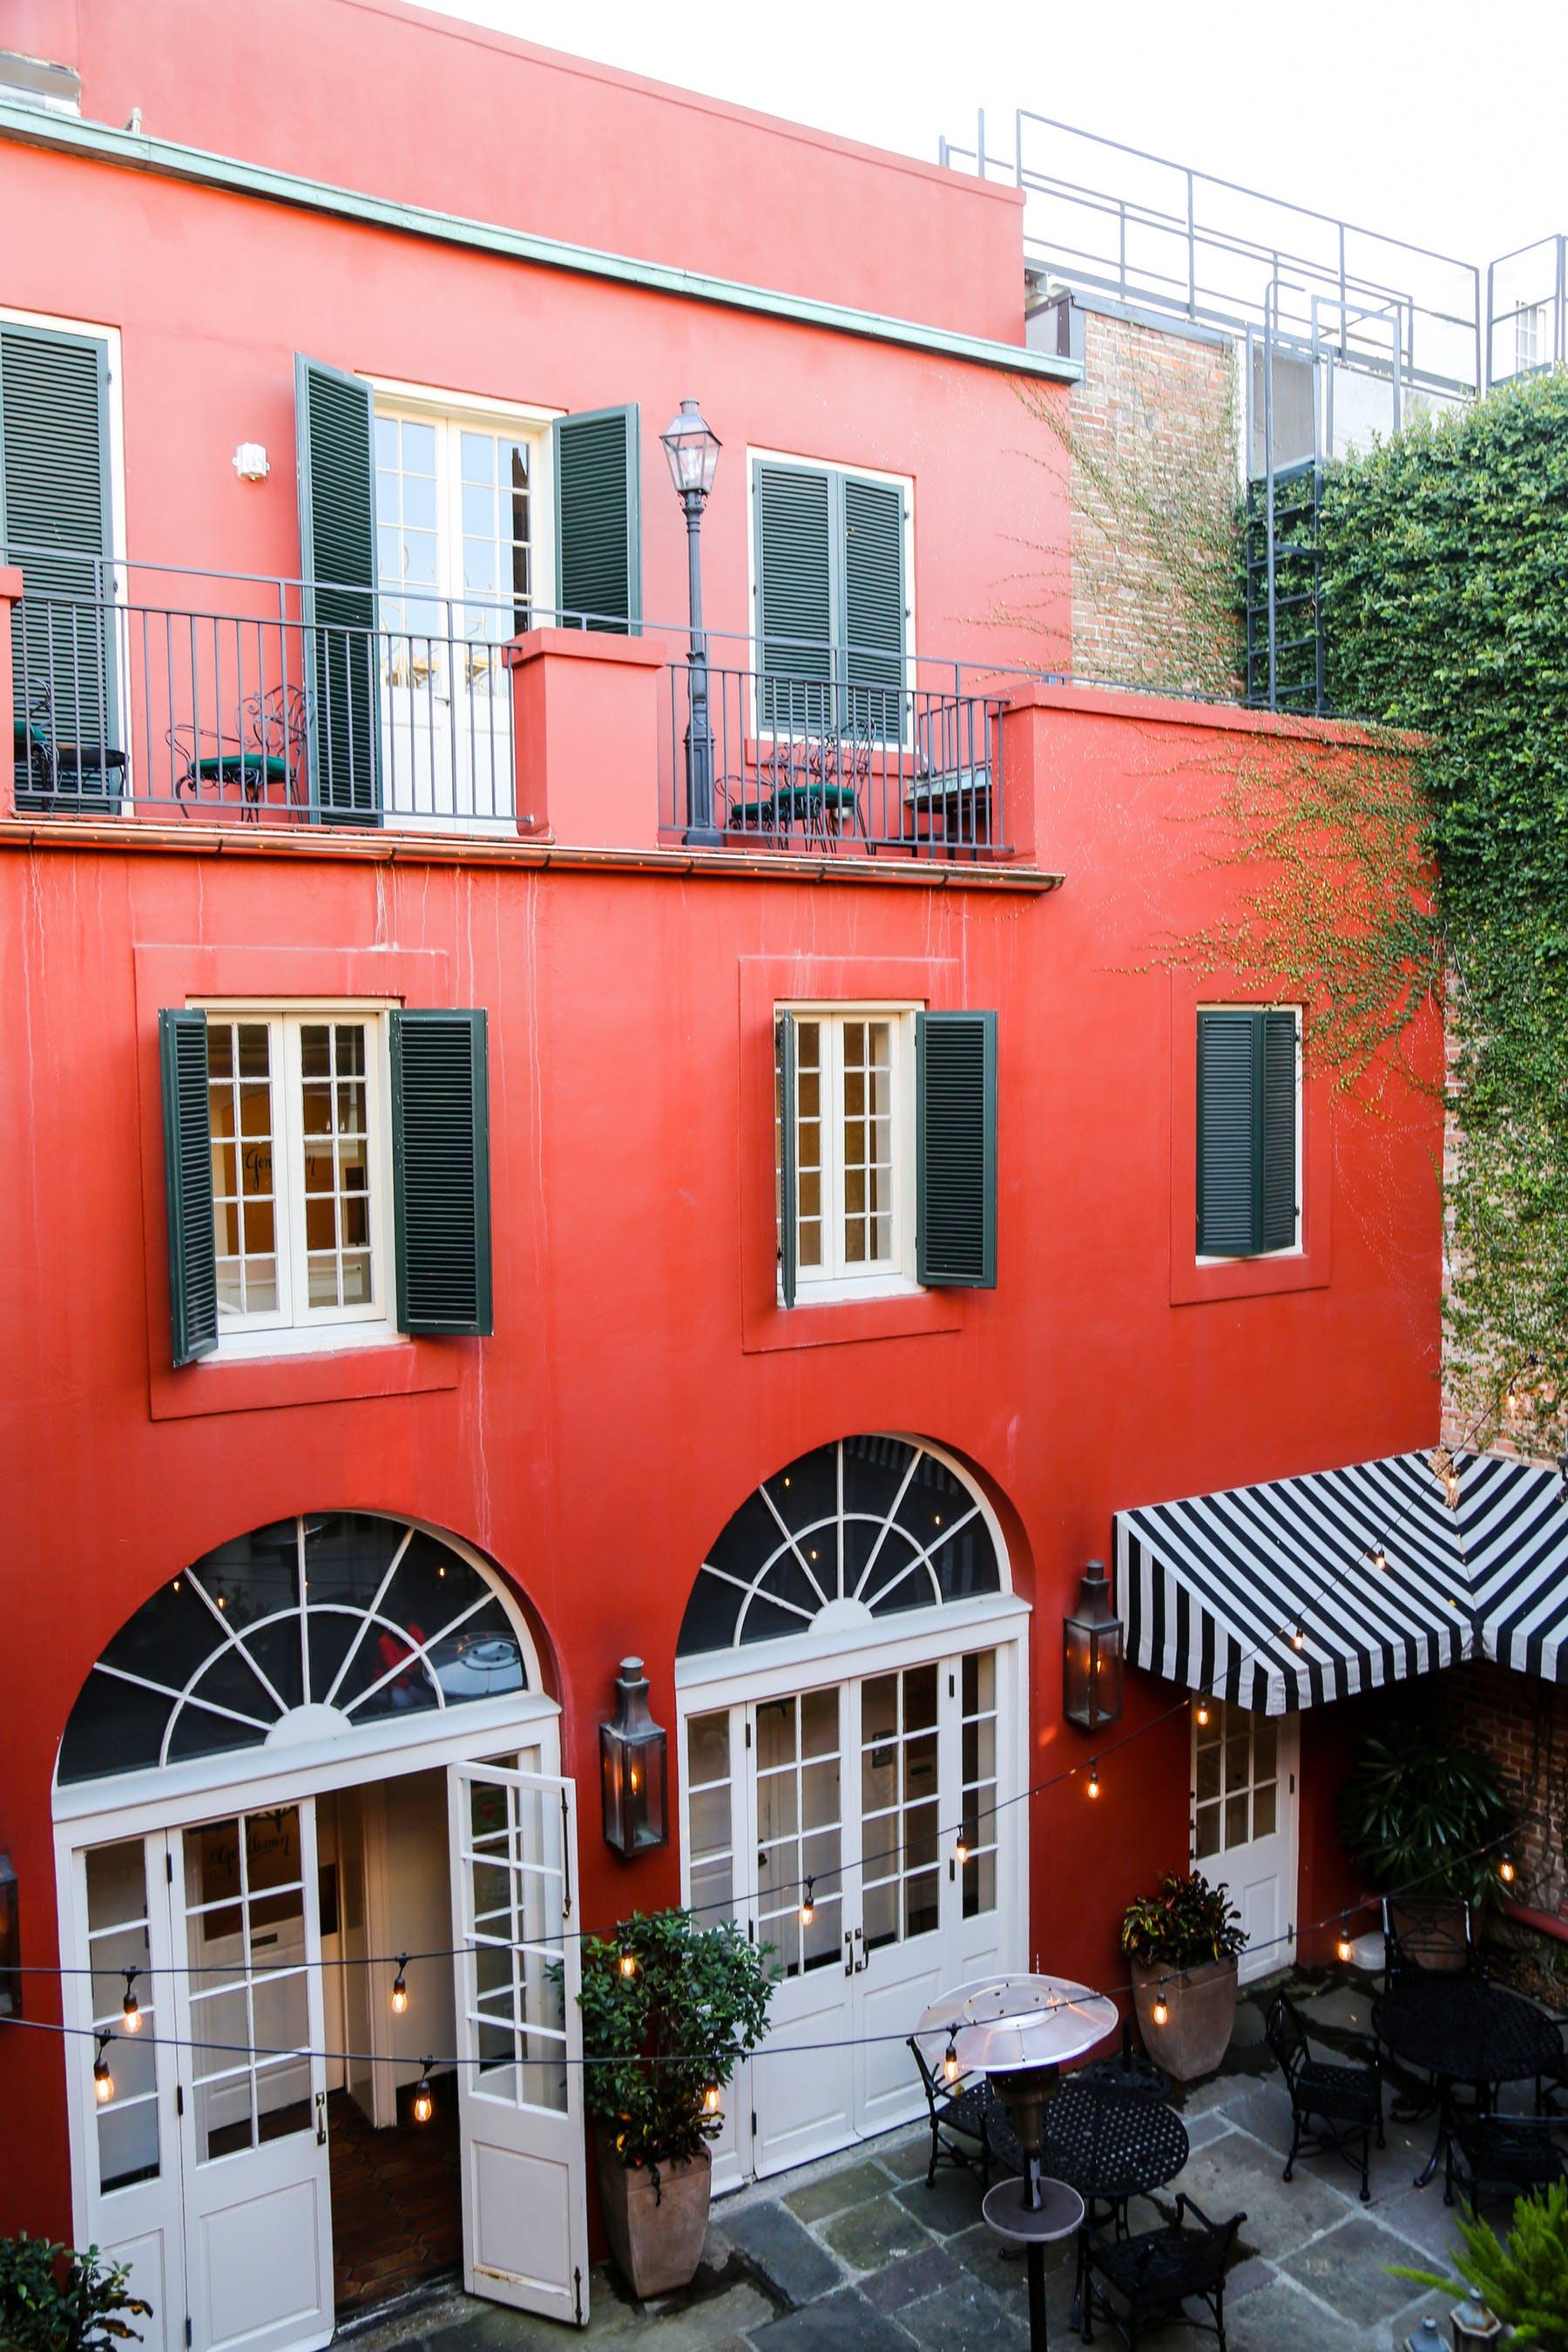 Tableau Courtyard.jpg